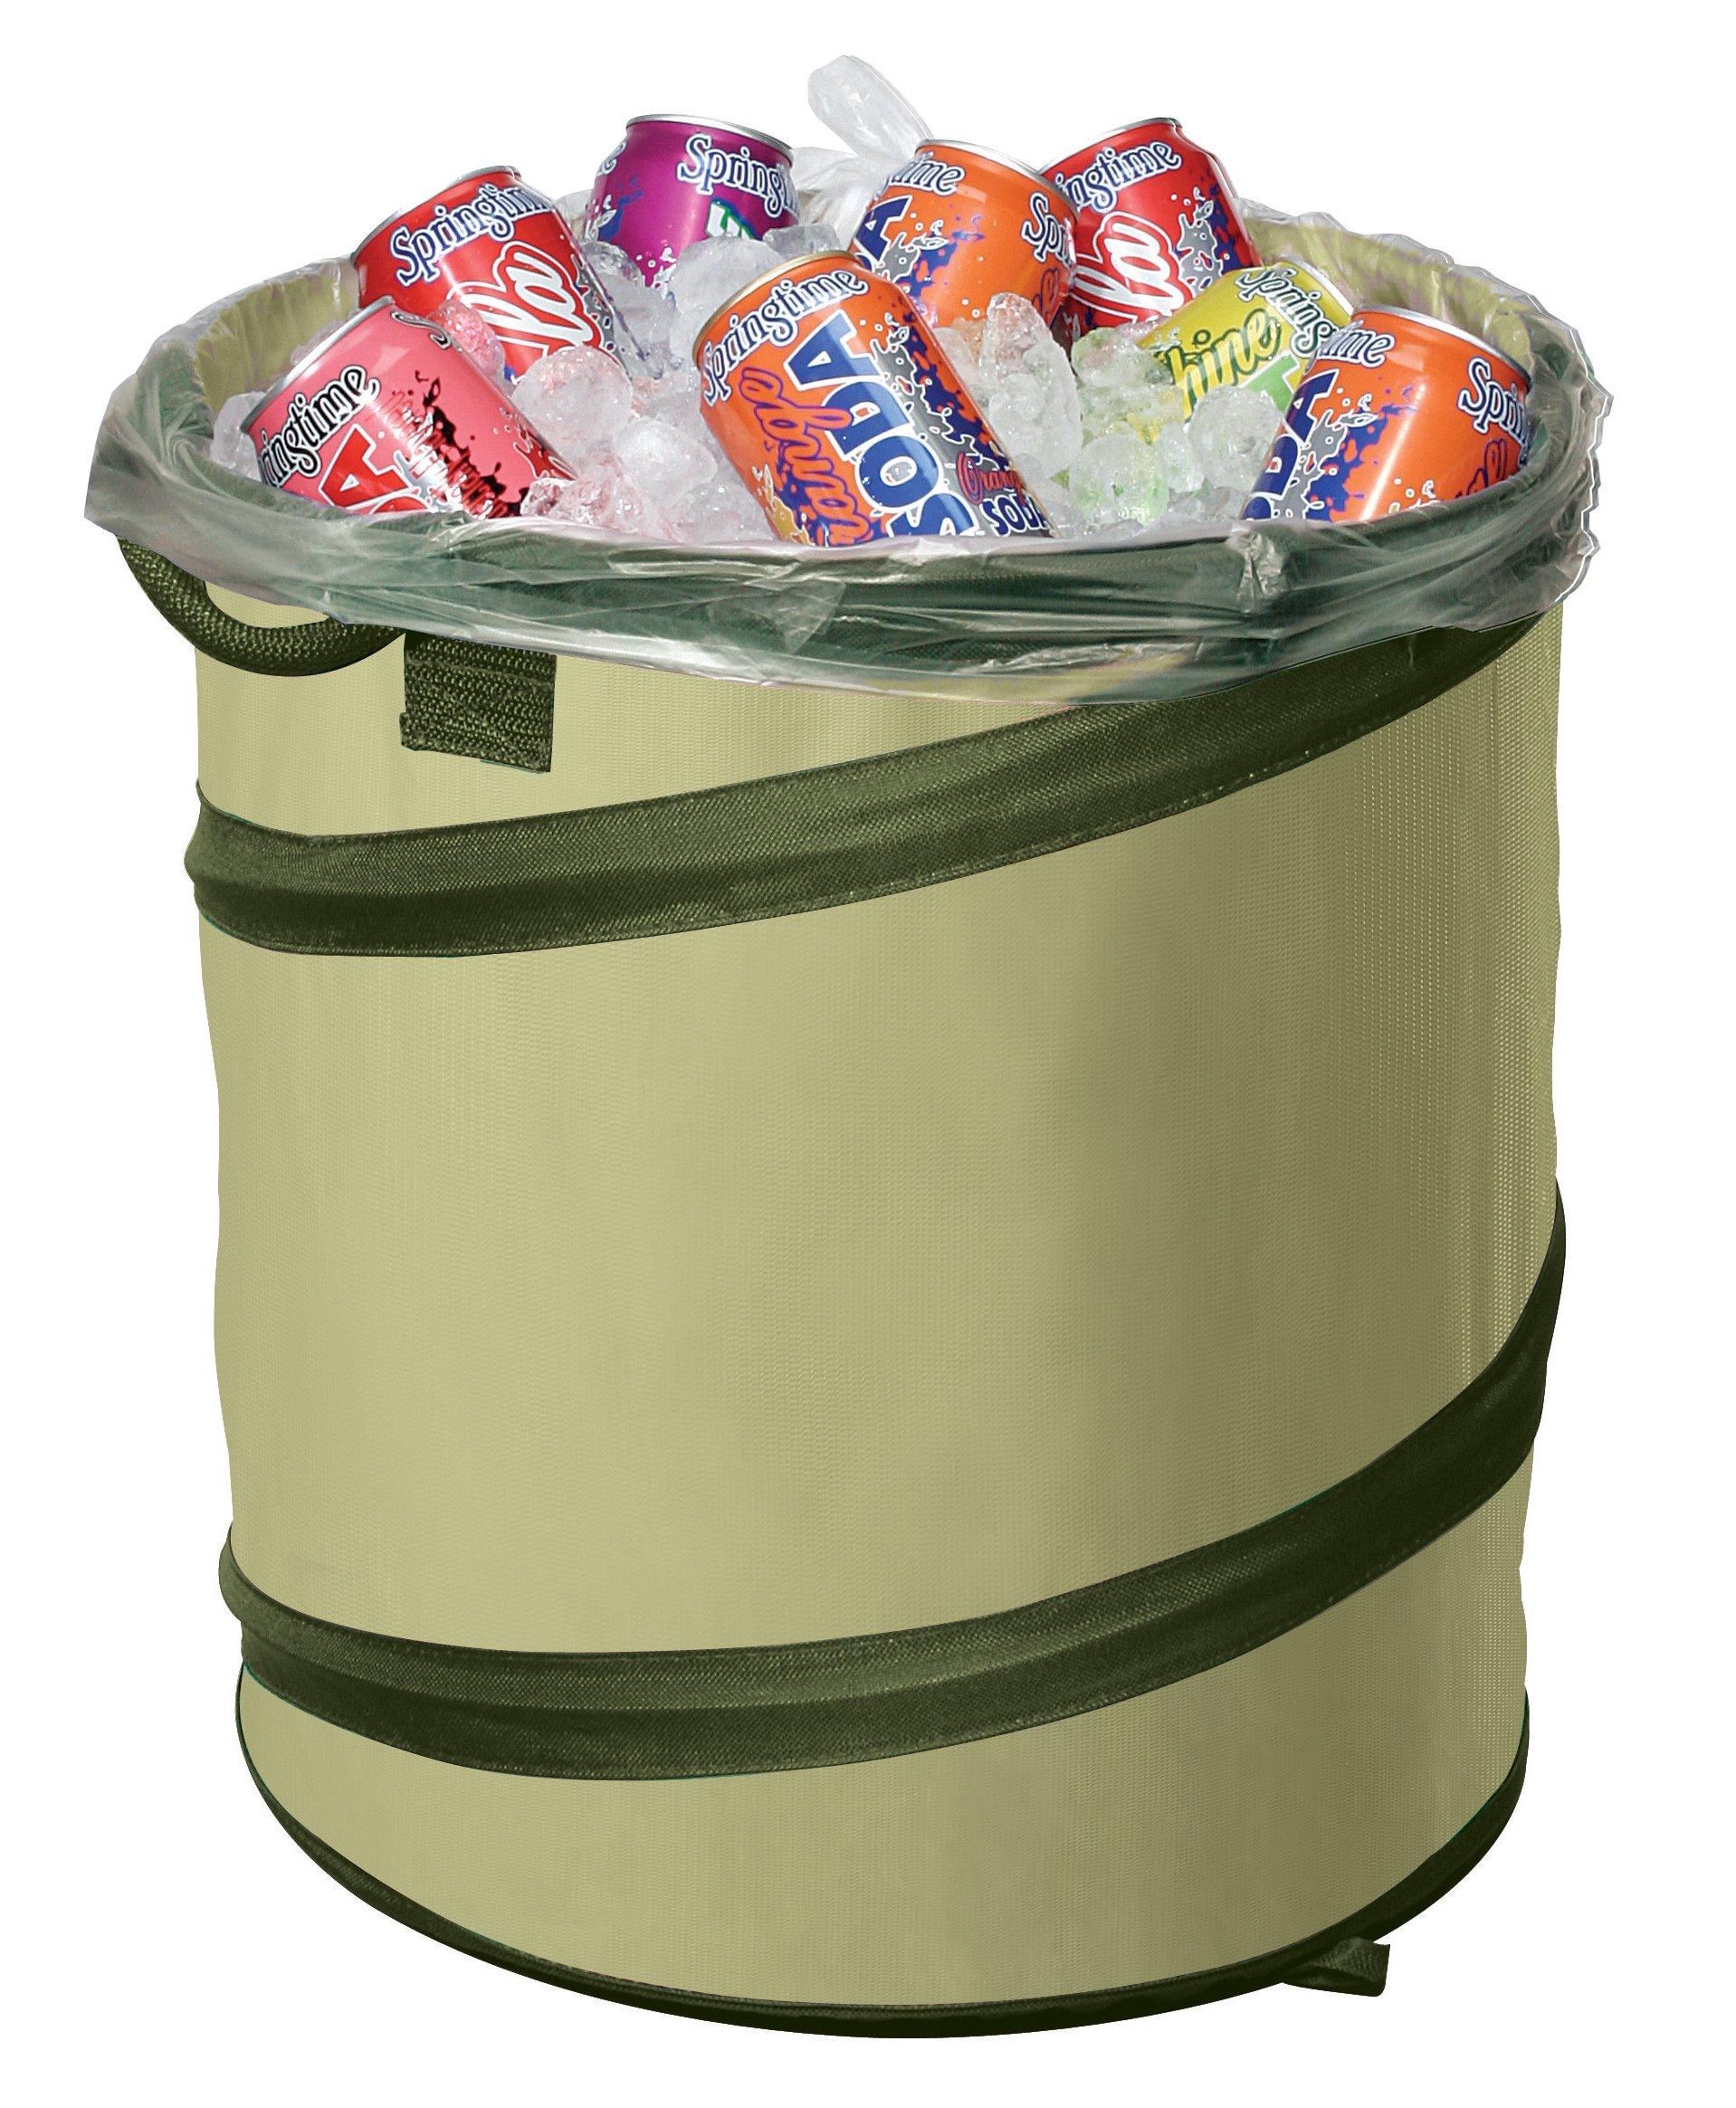 Fiskars 10 Gallon Kangaroo Gardening Bag, 10 Gallon Capacity, Green, 94046974J